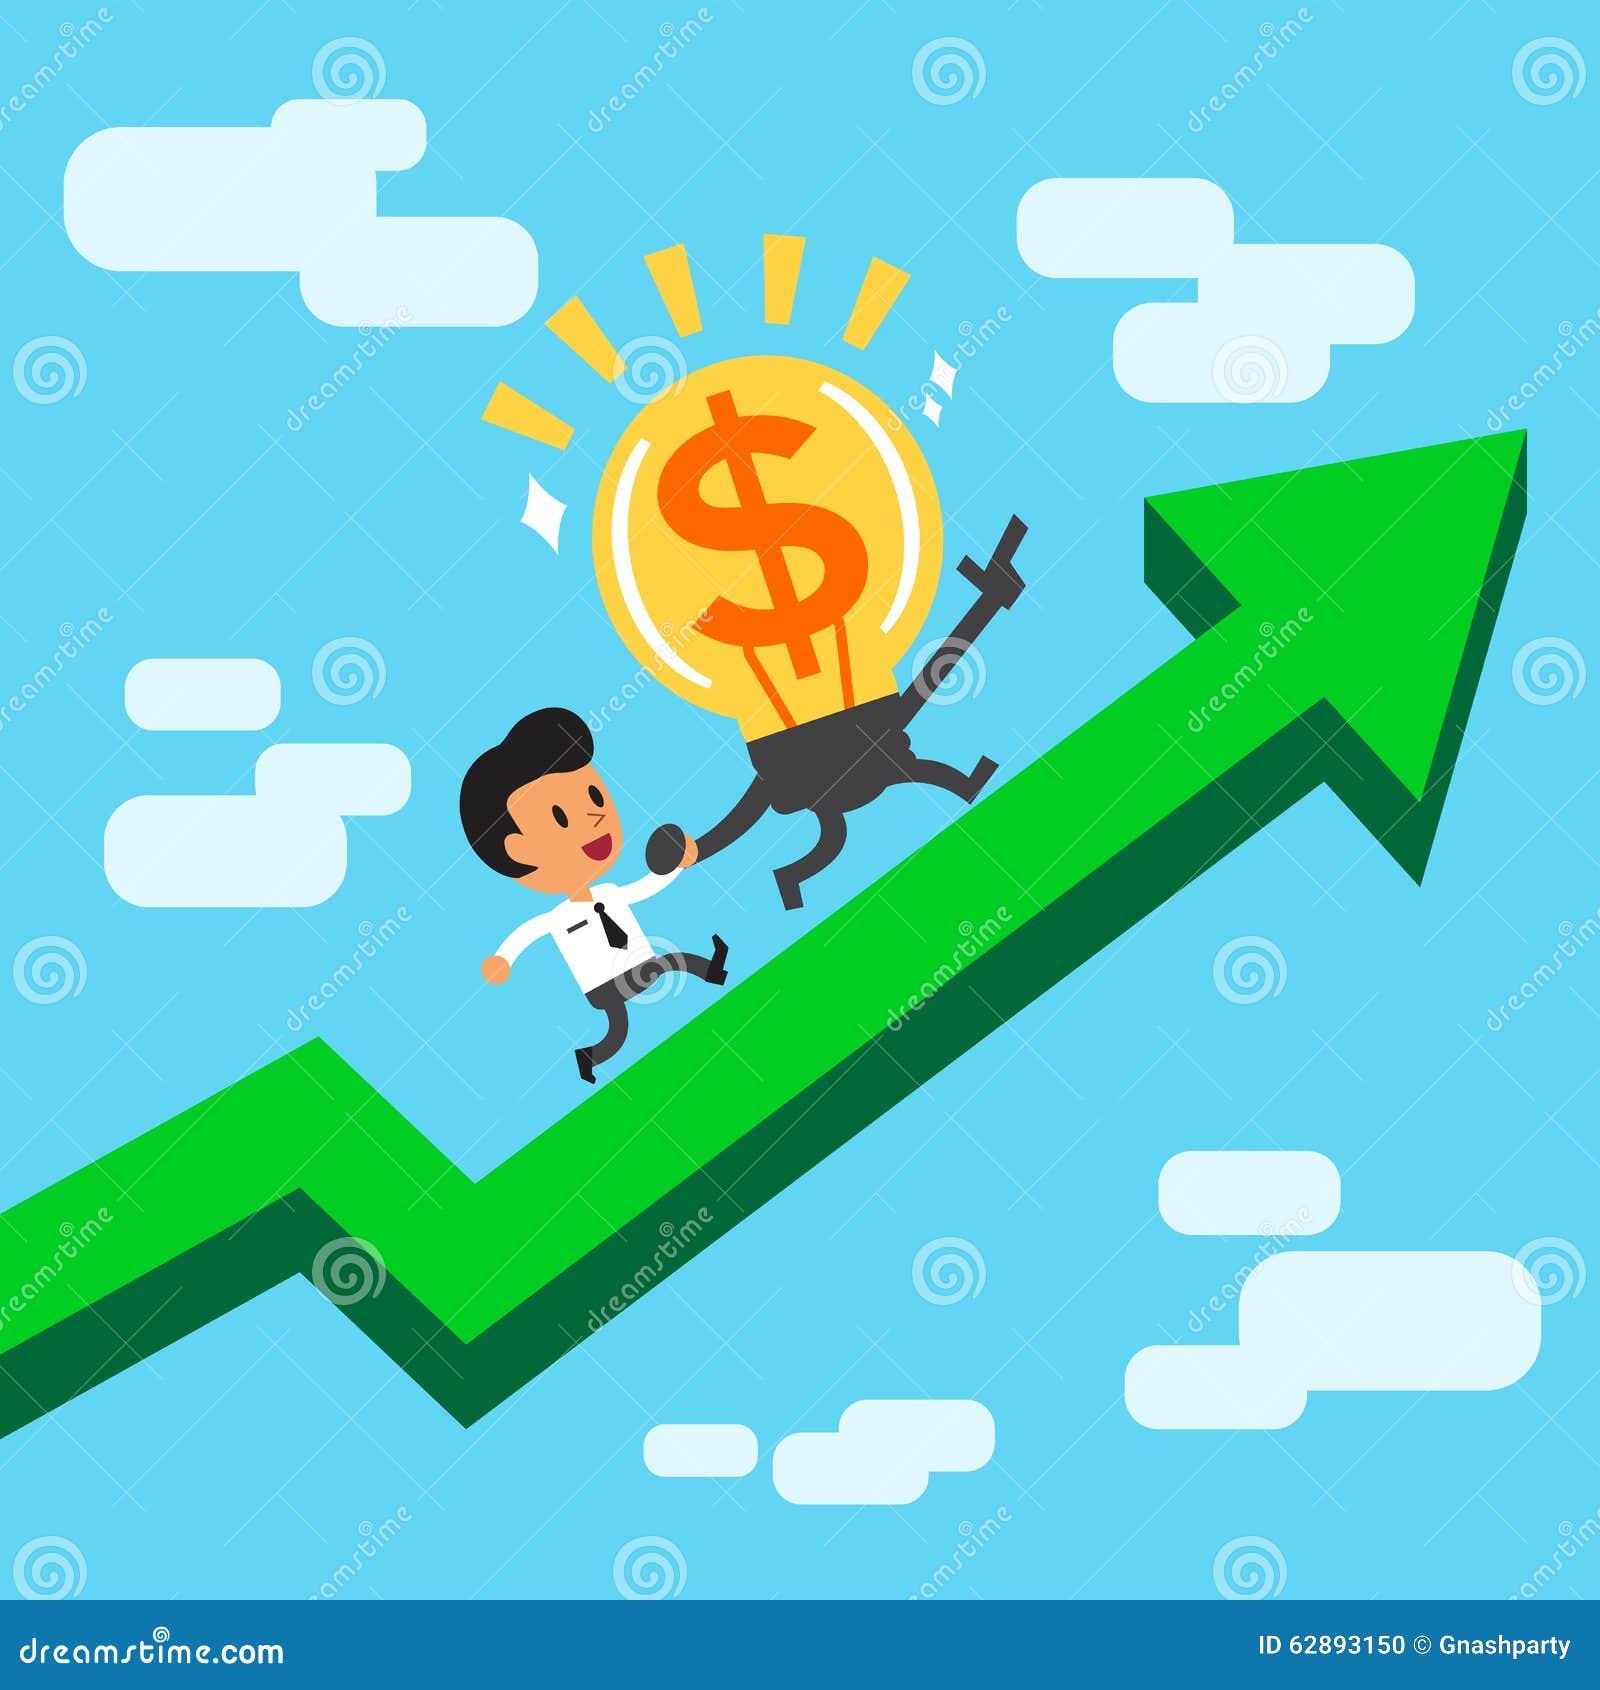 Cartoon character big money idea and businessman running